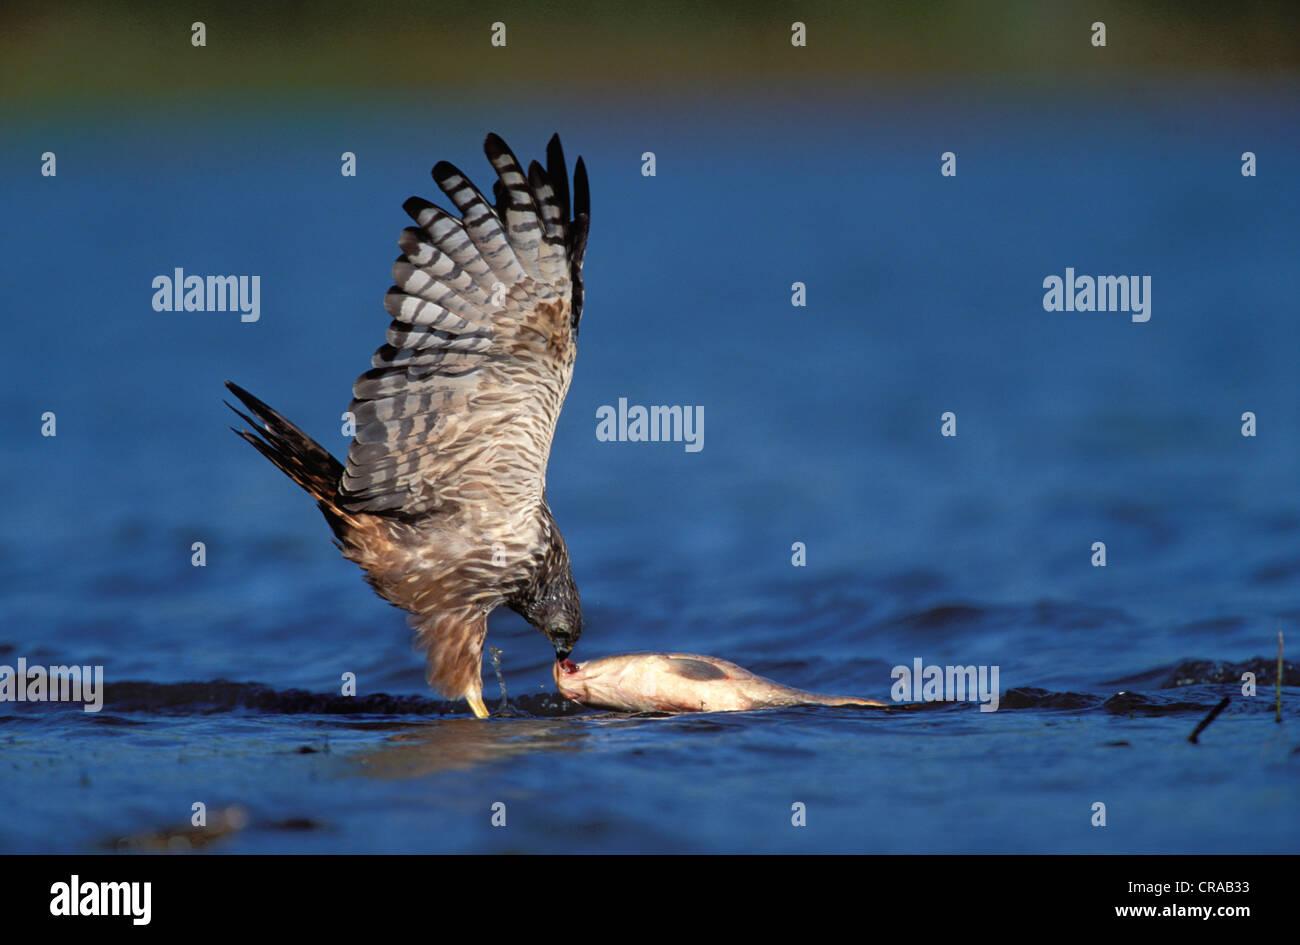 African Marsh Harrier (Circus raninorus), catching fish, KwaZulu-Natal, South Africa - Stock Image